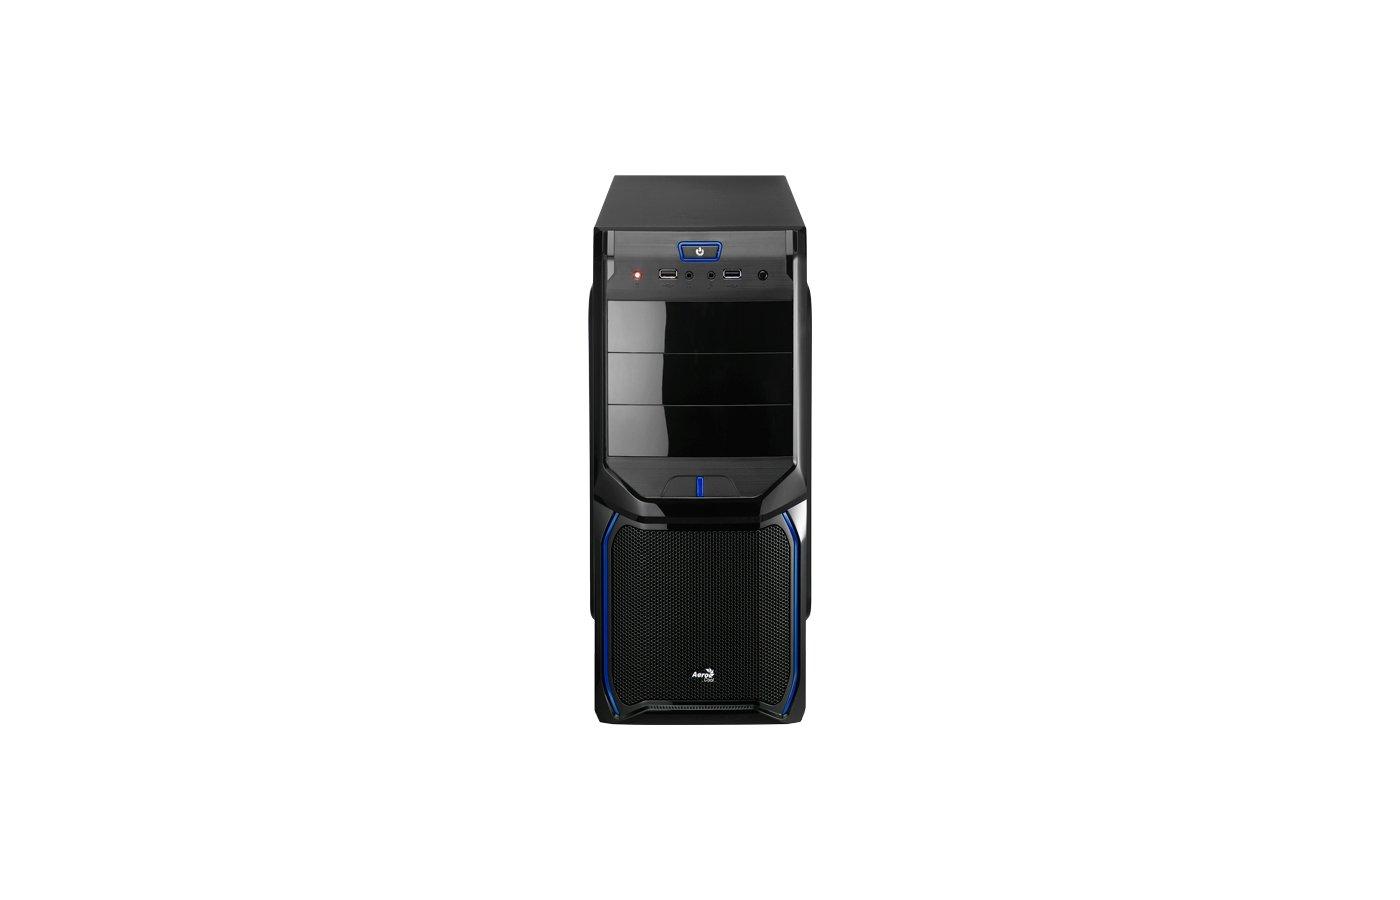 Корпус Aerocool V3X черный/голубой без БП ATX 1x80mm 2xUSB2.0 audio